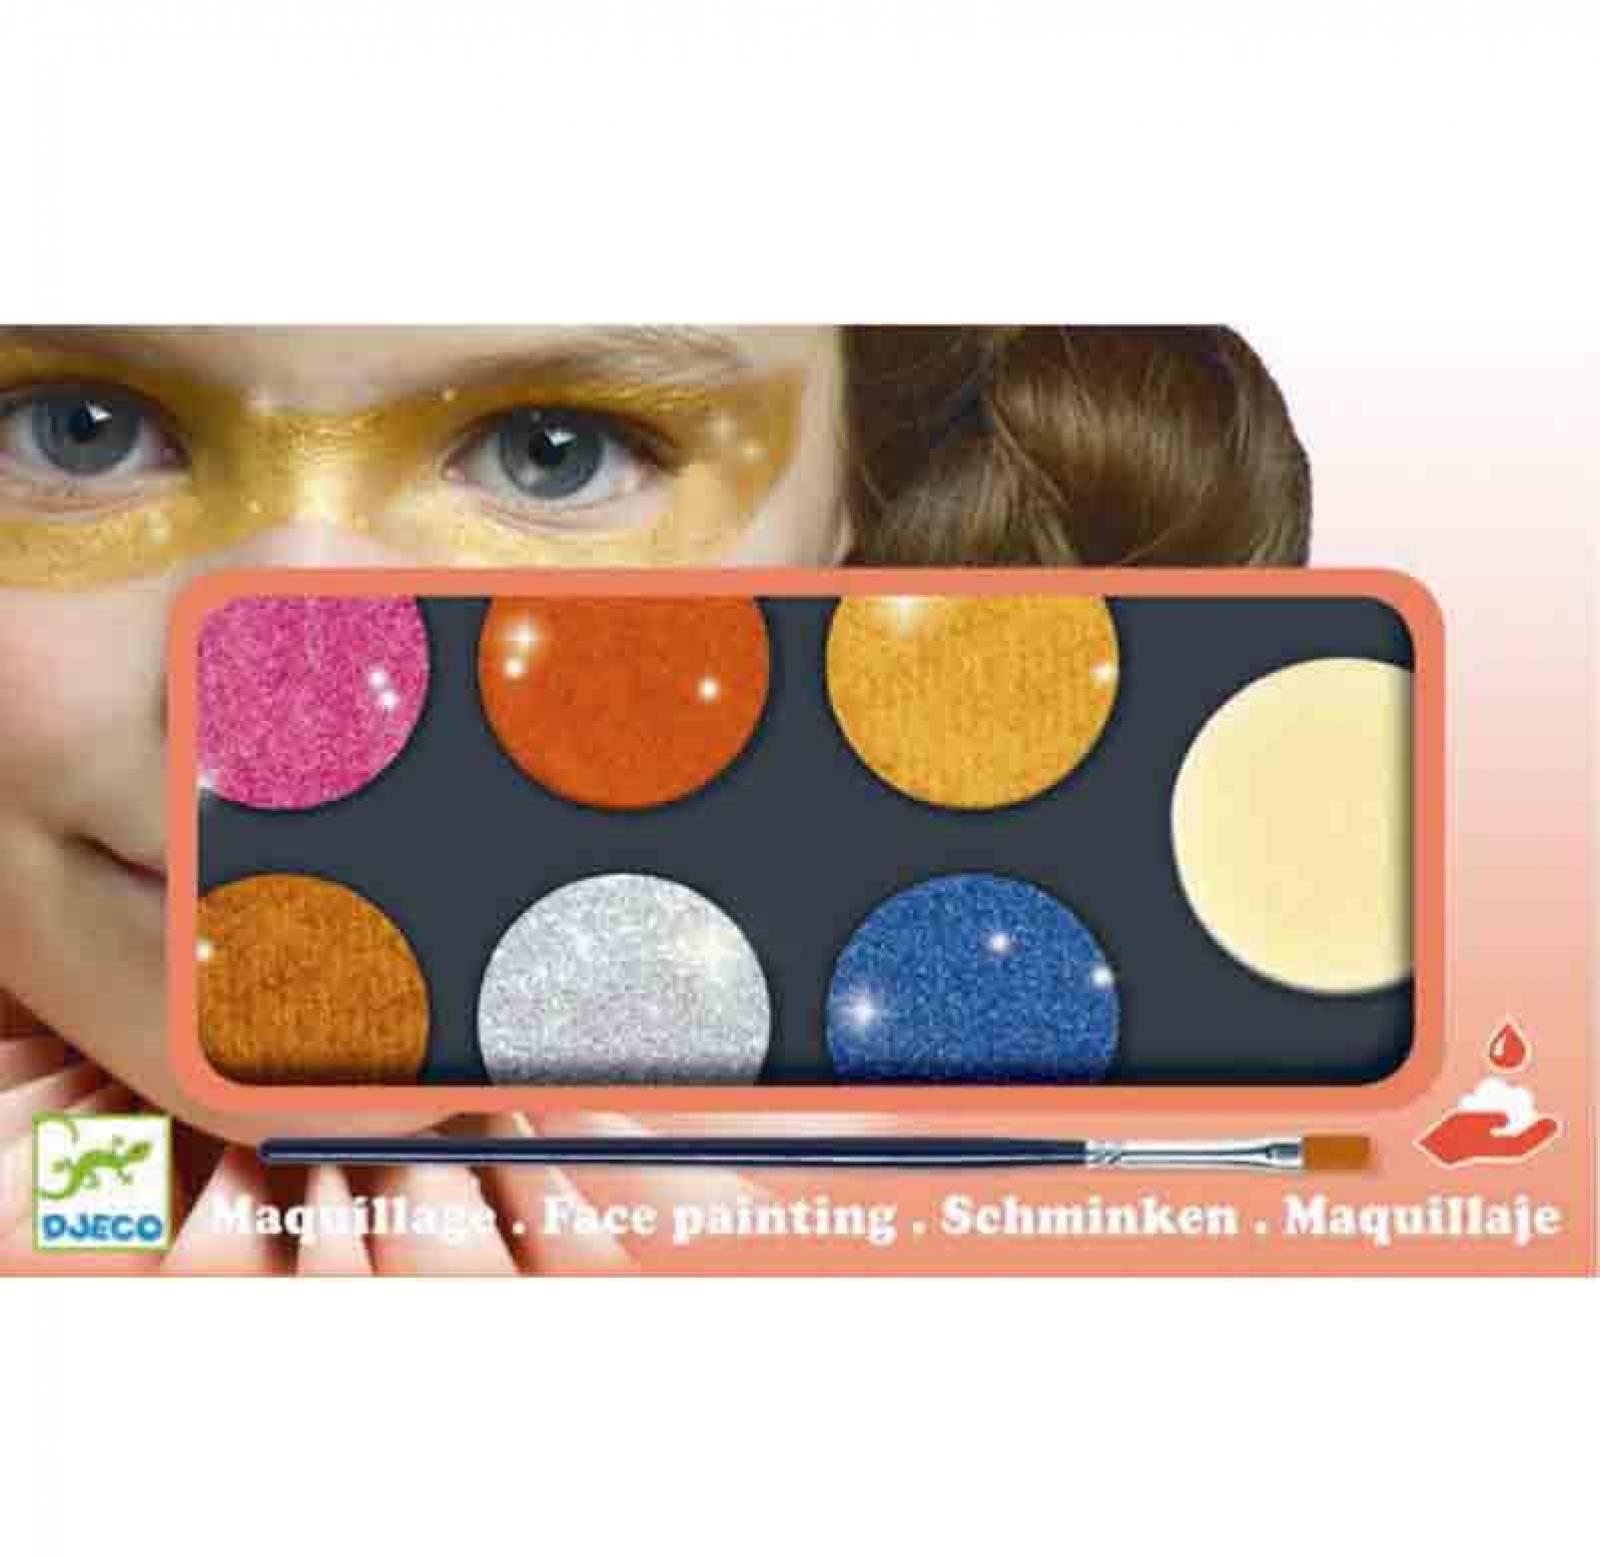 Face Painting Palette 6 Colours - Metallic Glitter